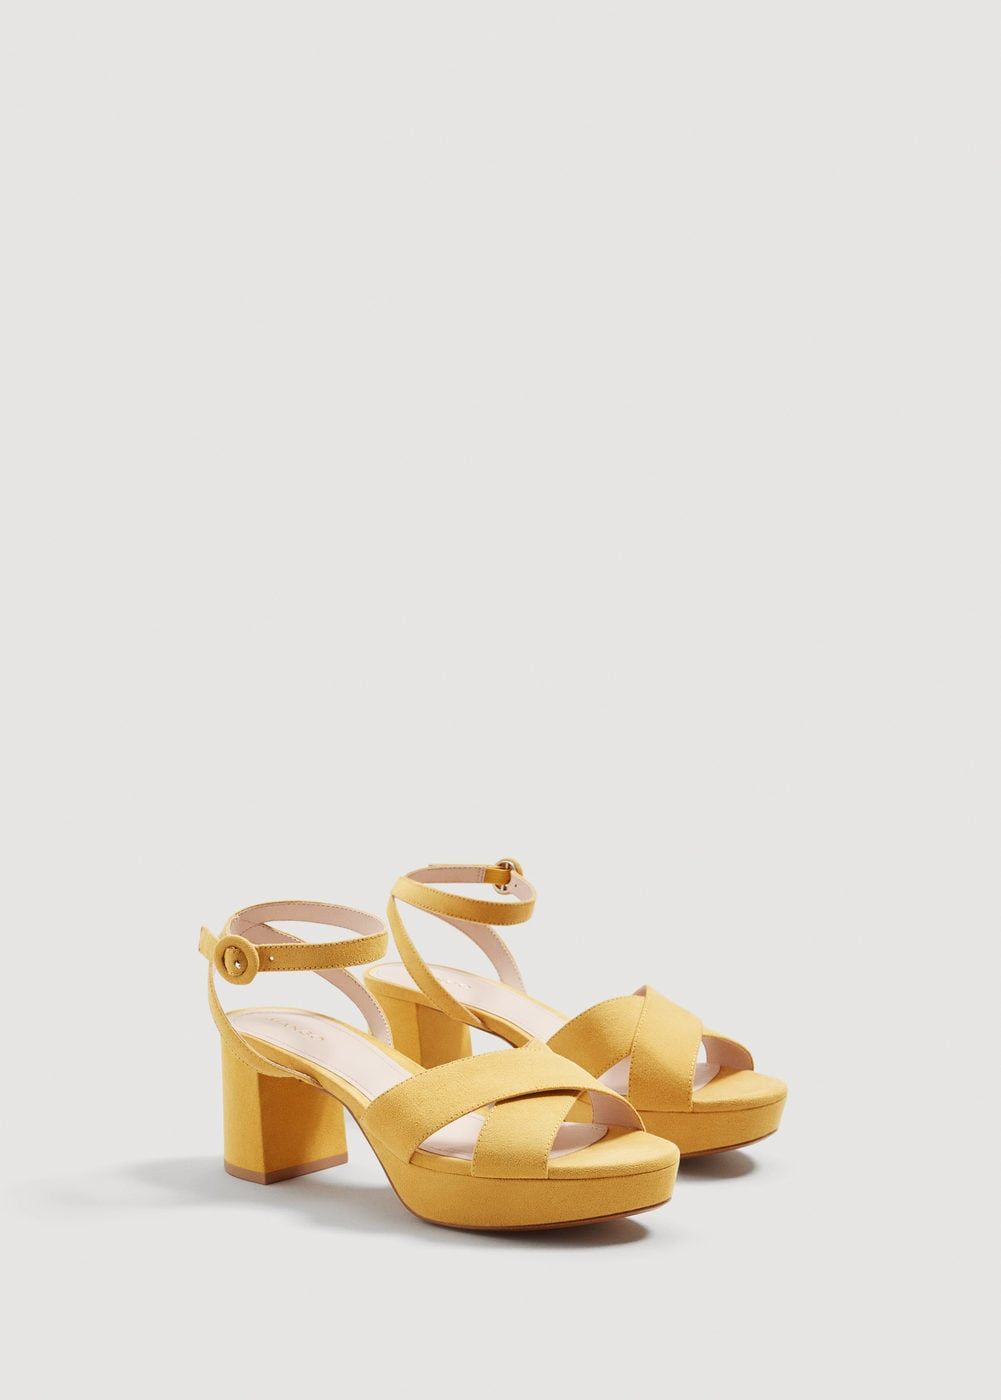 Sandalia cruzada plataforma | Sandals, Mango, Yellow shoes